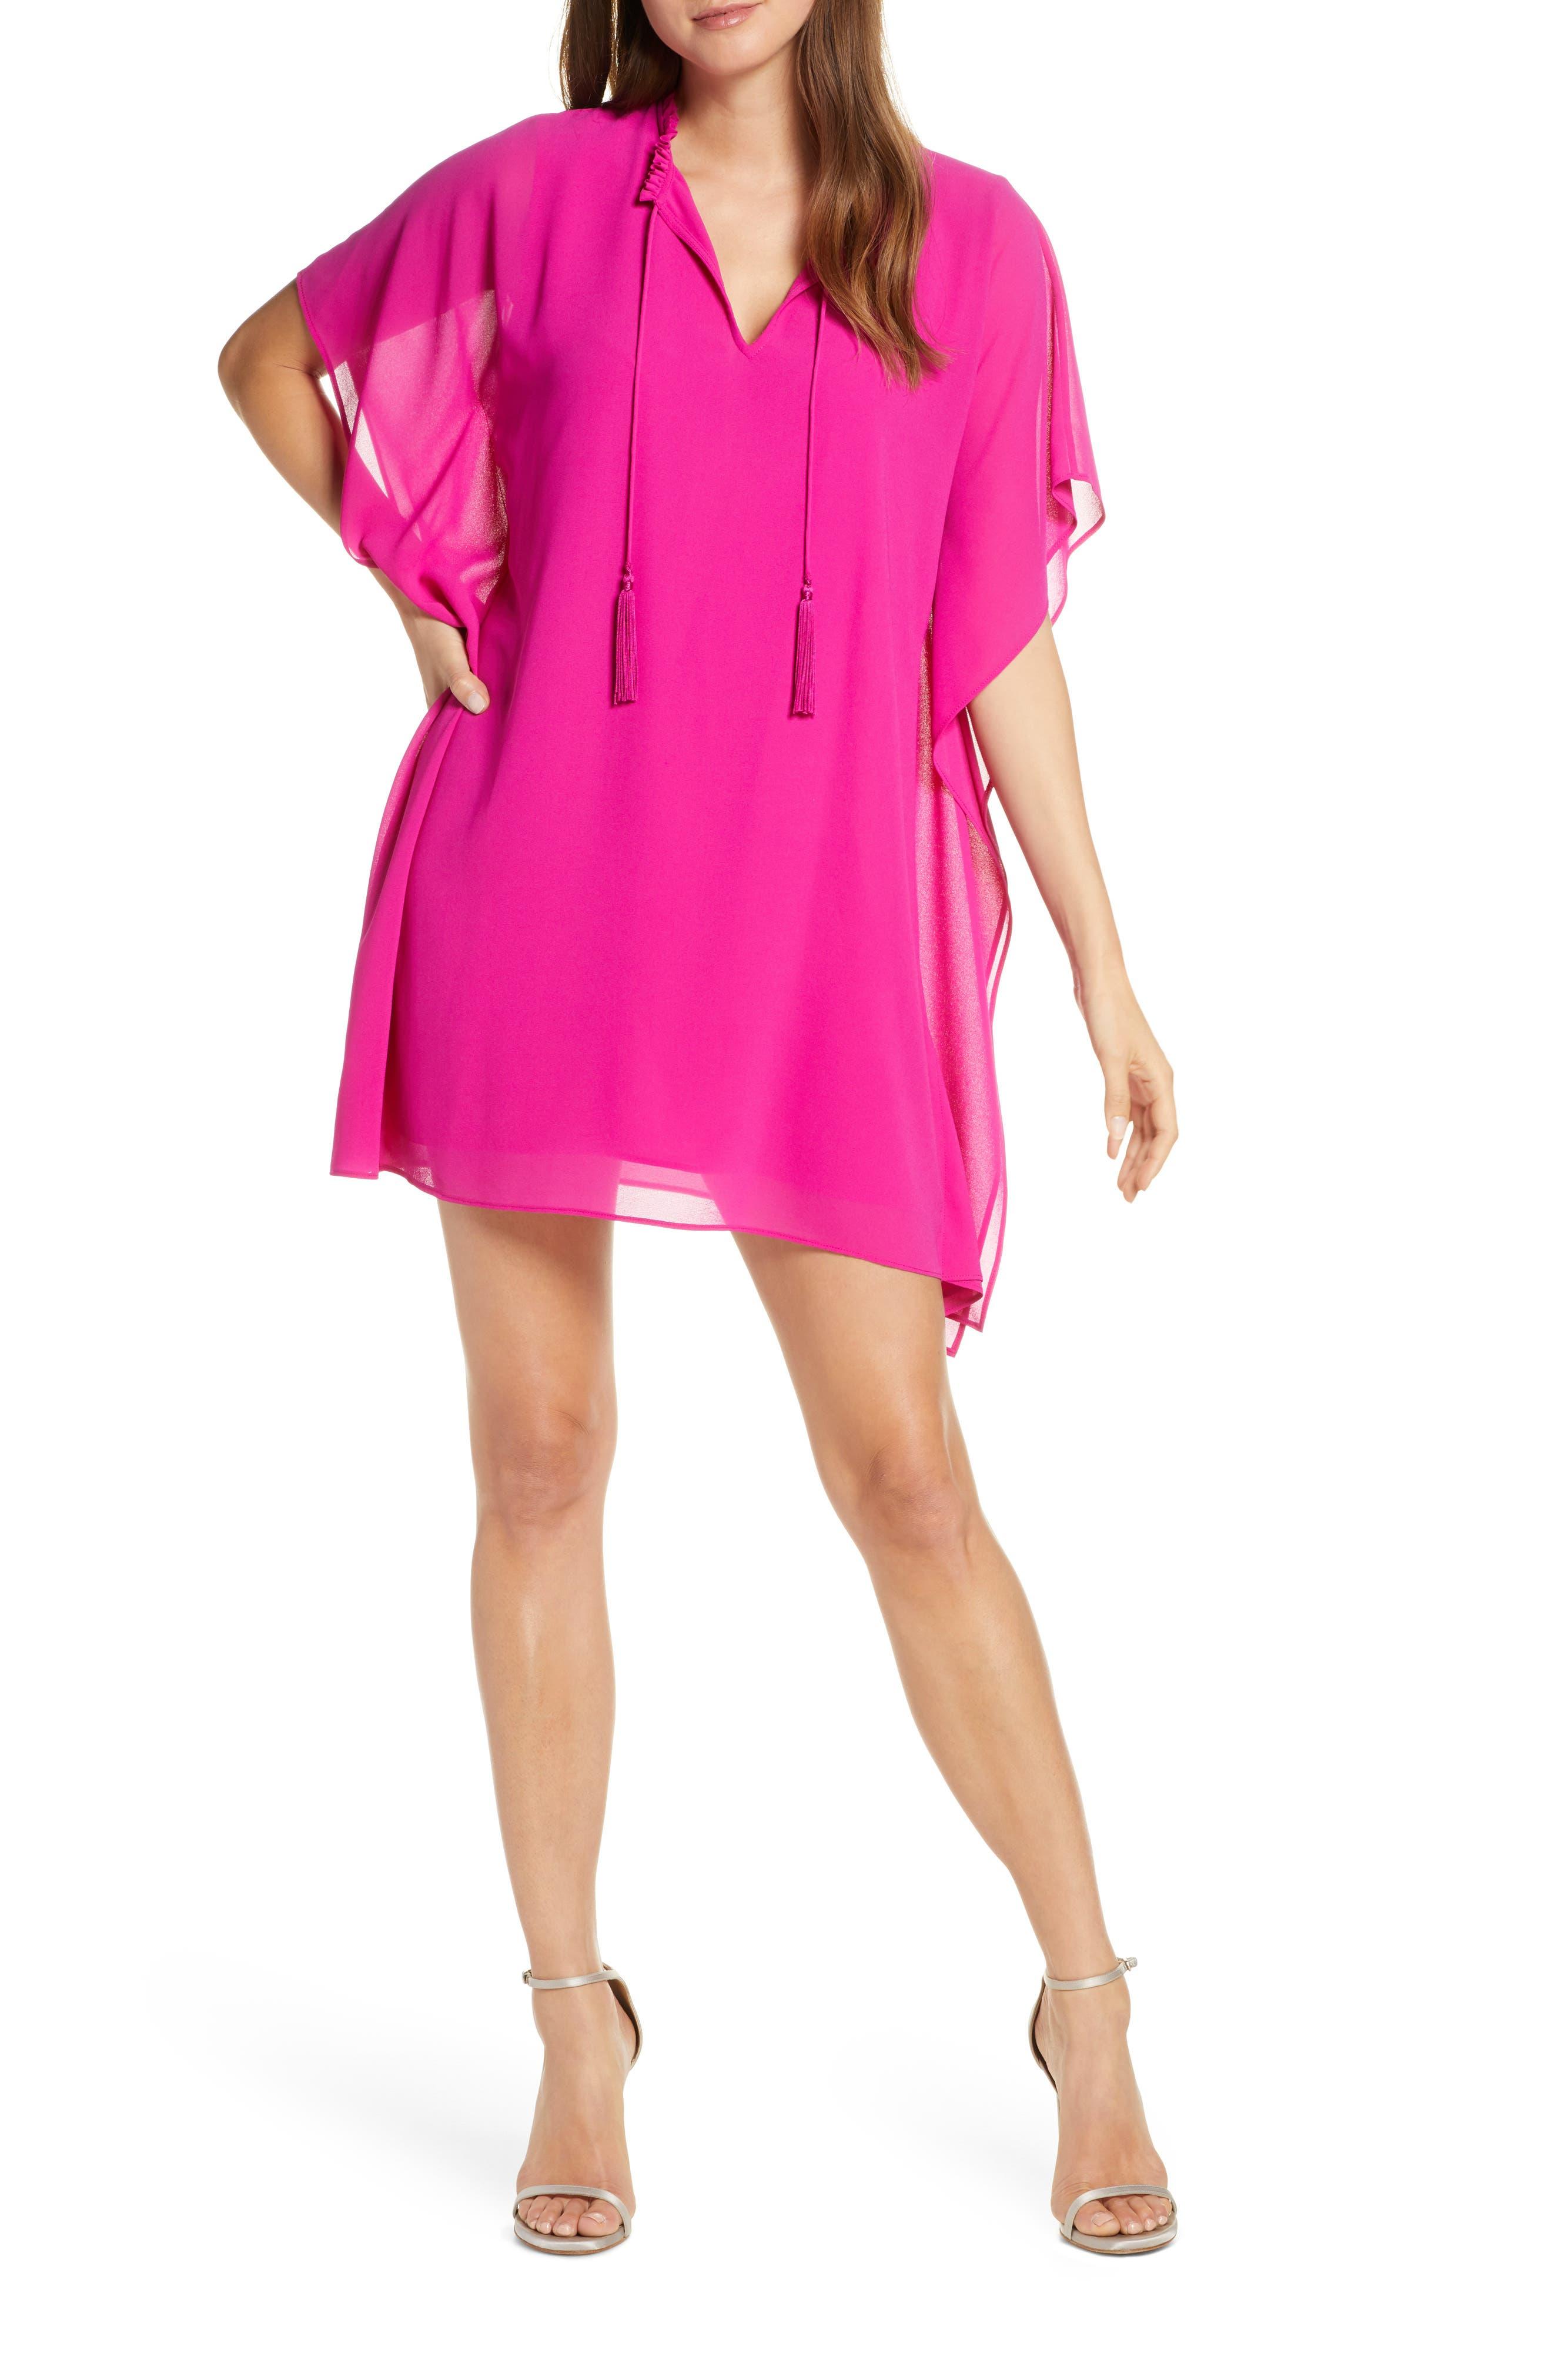 Mark + James By Badgley Mischka Split Neck Chiffon Caftan Minidress, Pink